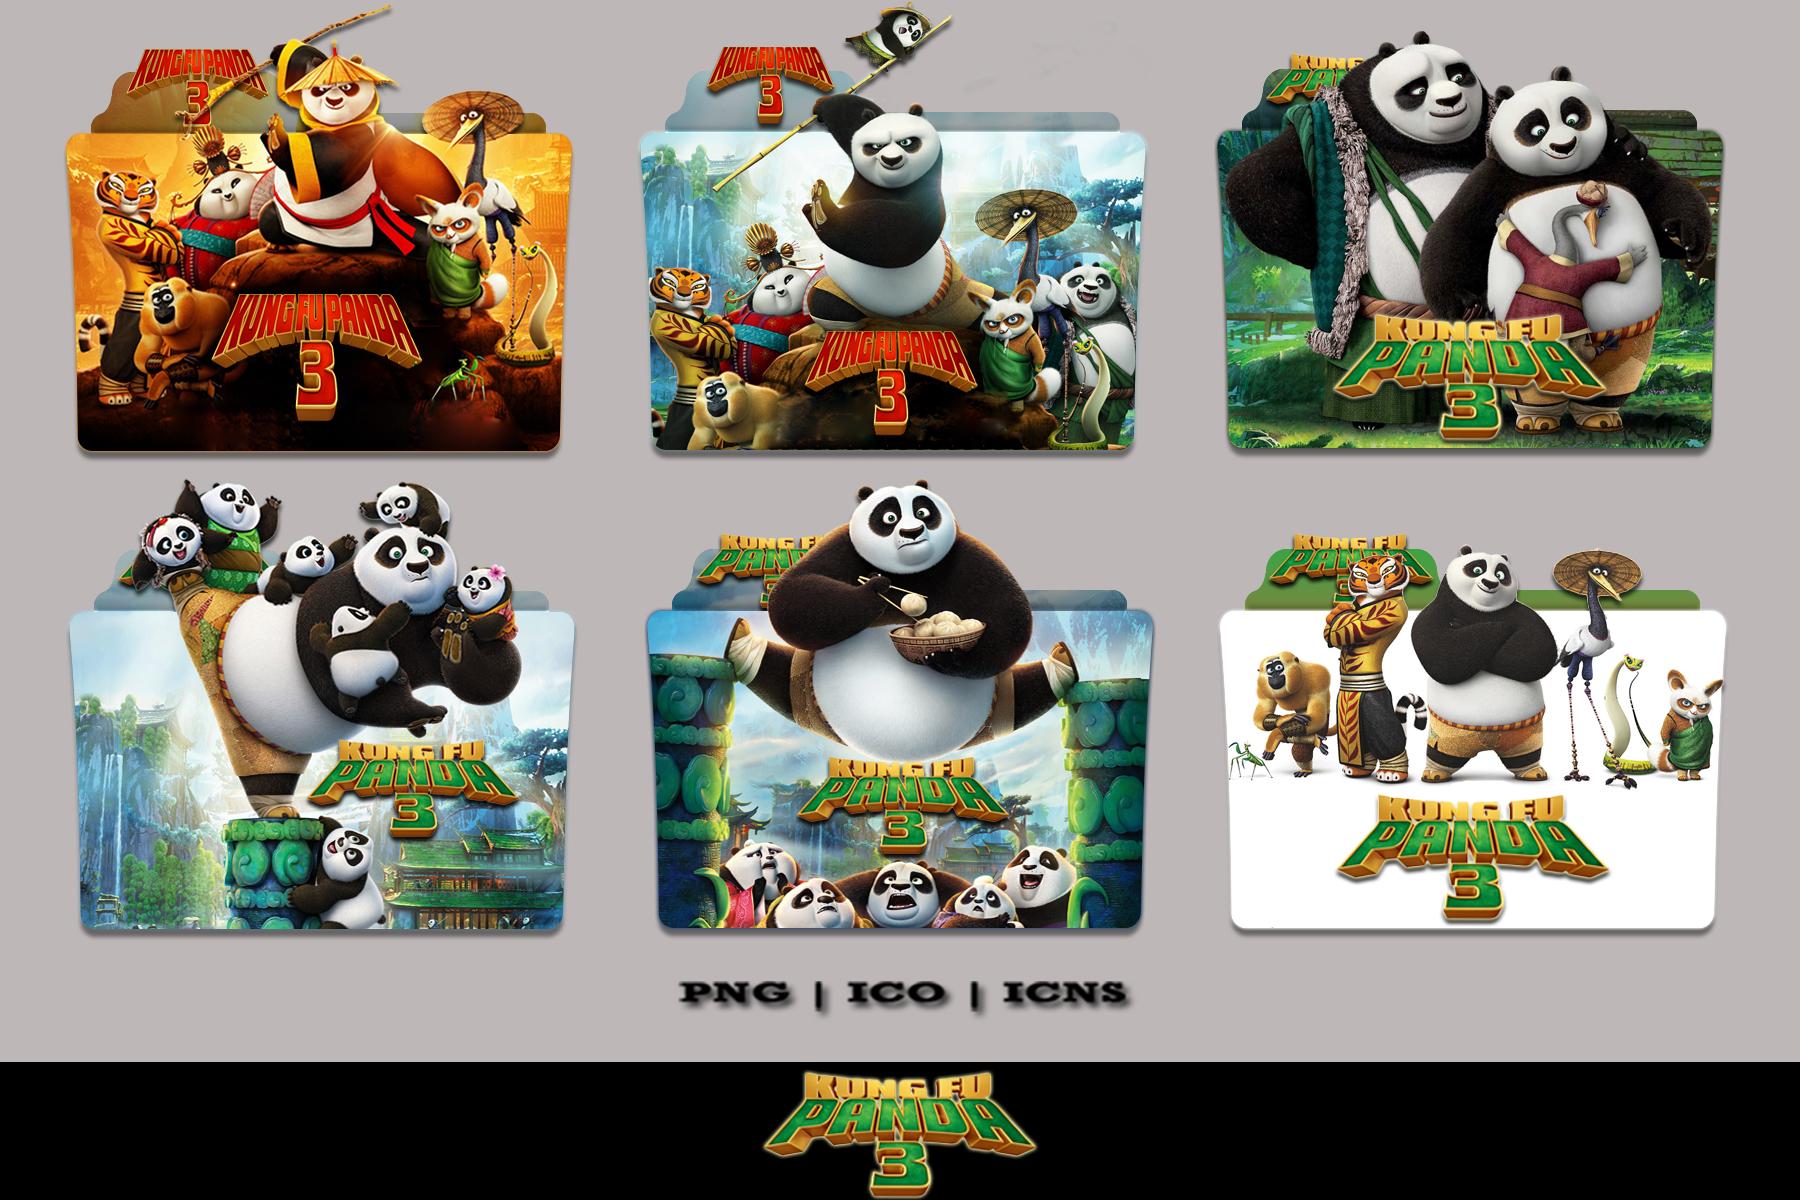 Kung Fu Panda 3 2016 Folder Icon Pack By Bl4cksl4yer On Deviantart